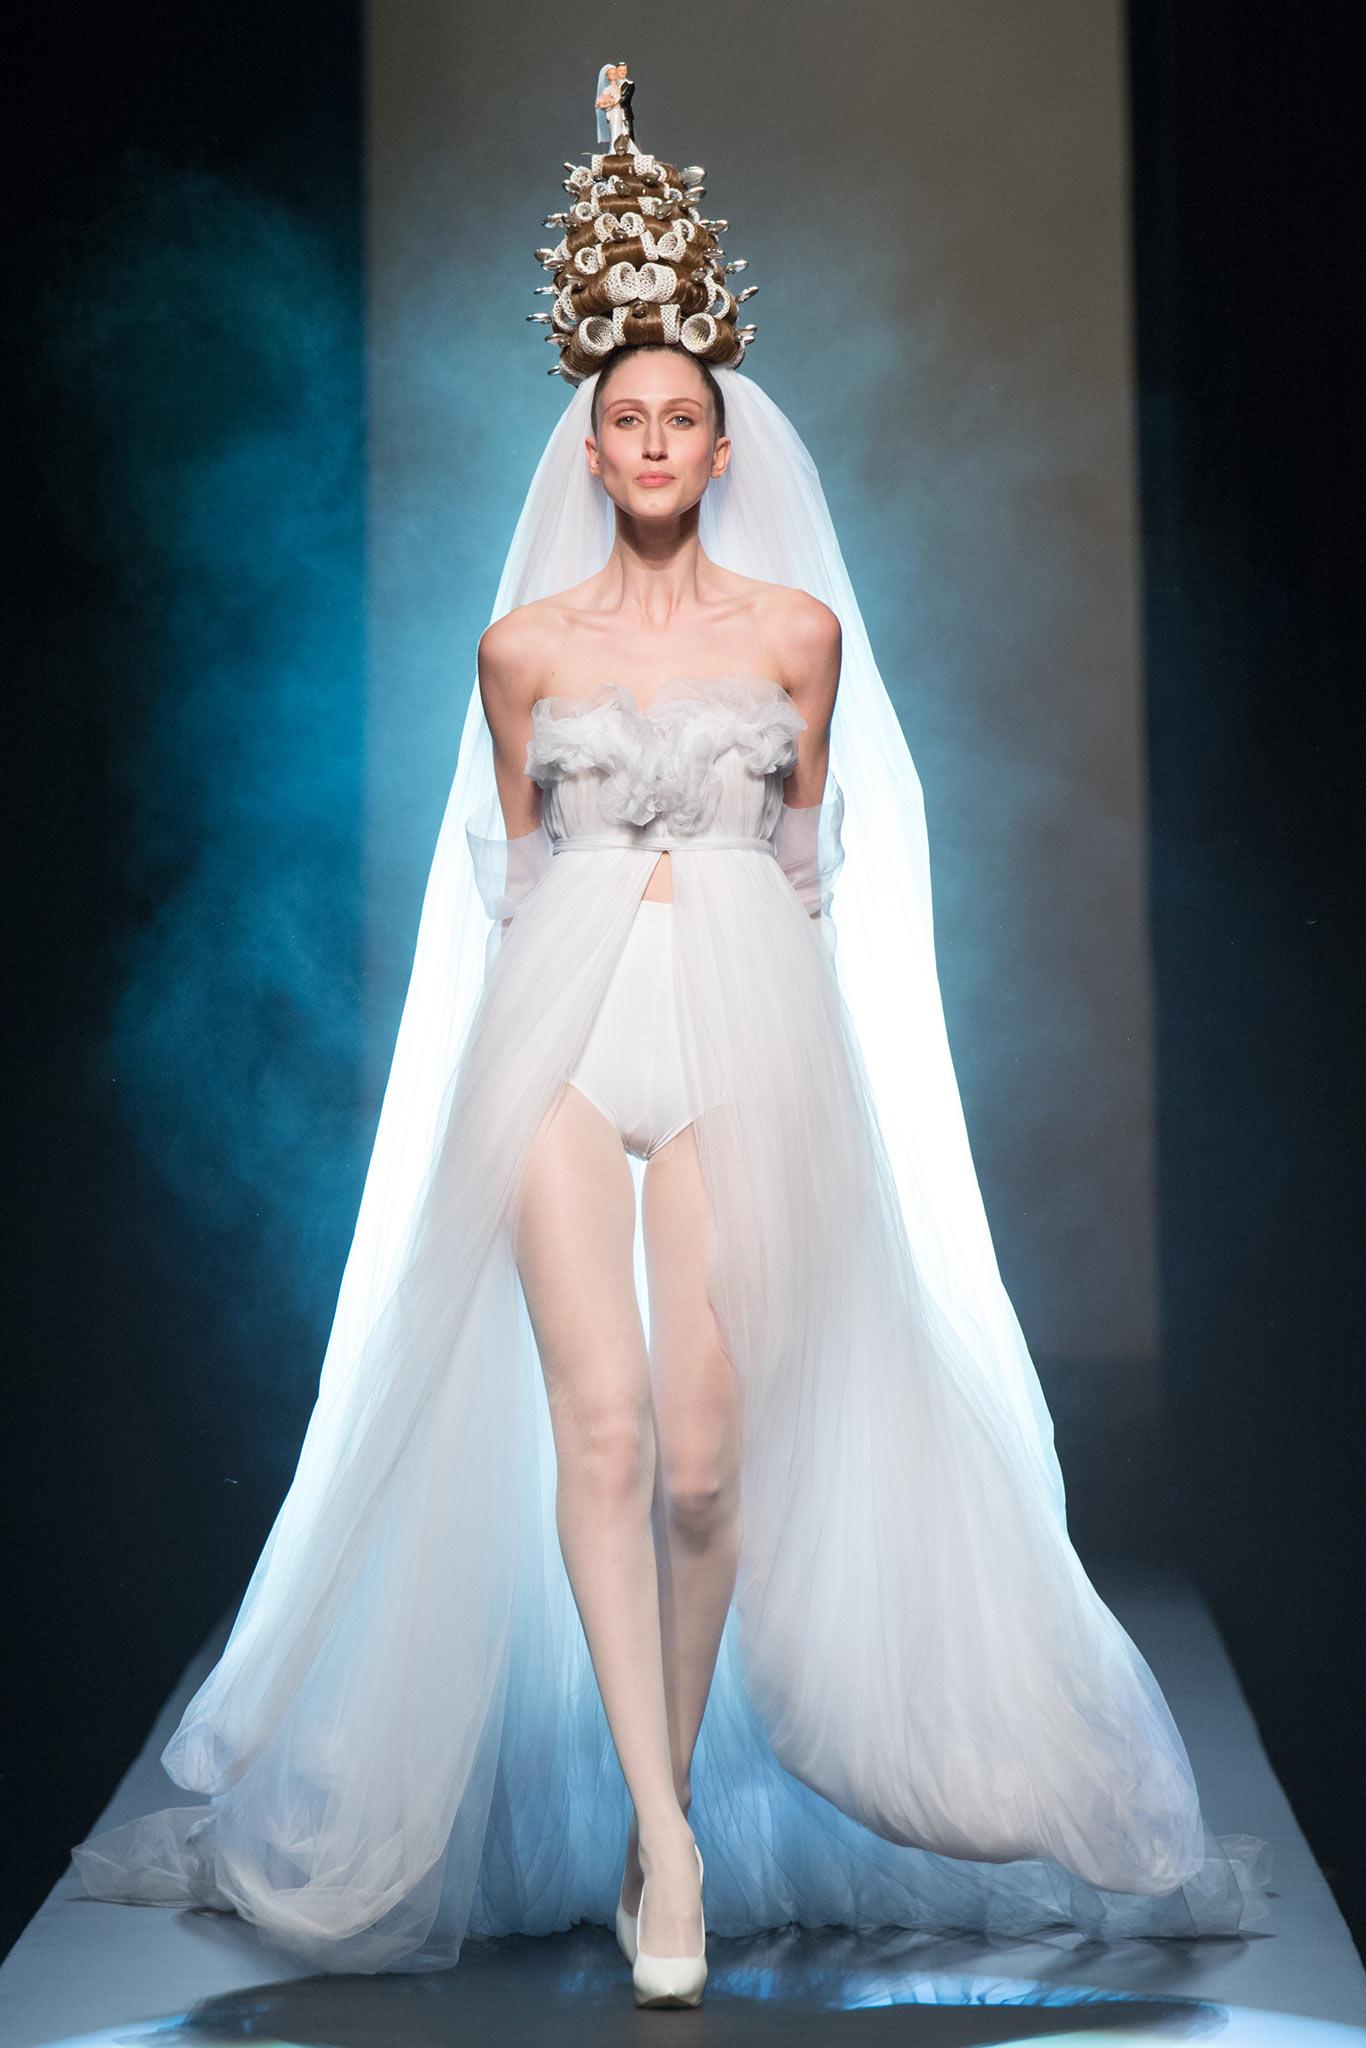 Paris Spring 2015 Couture: Jean Paul Gaultier – Ani & Izzy